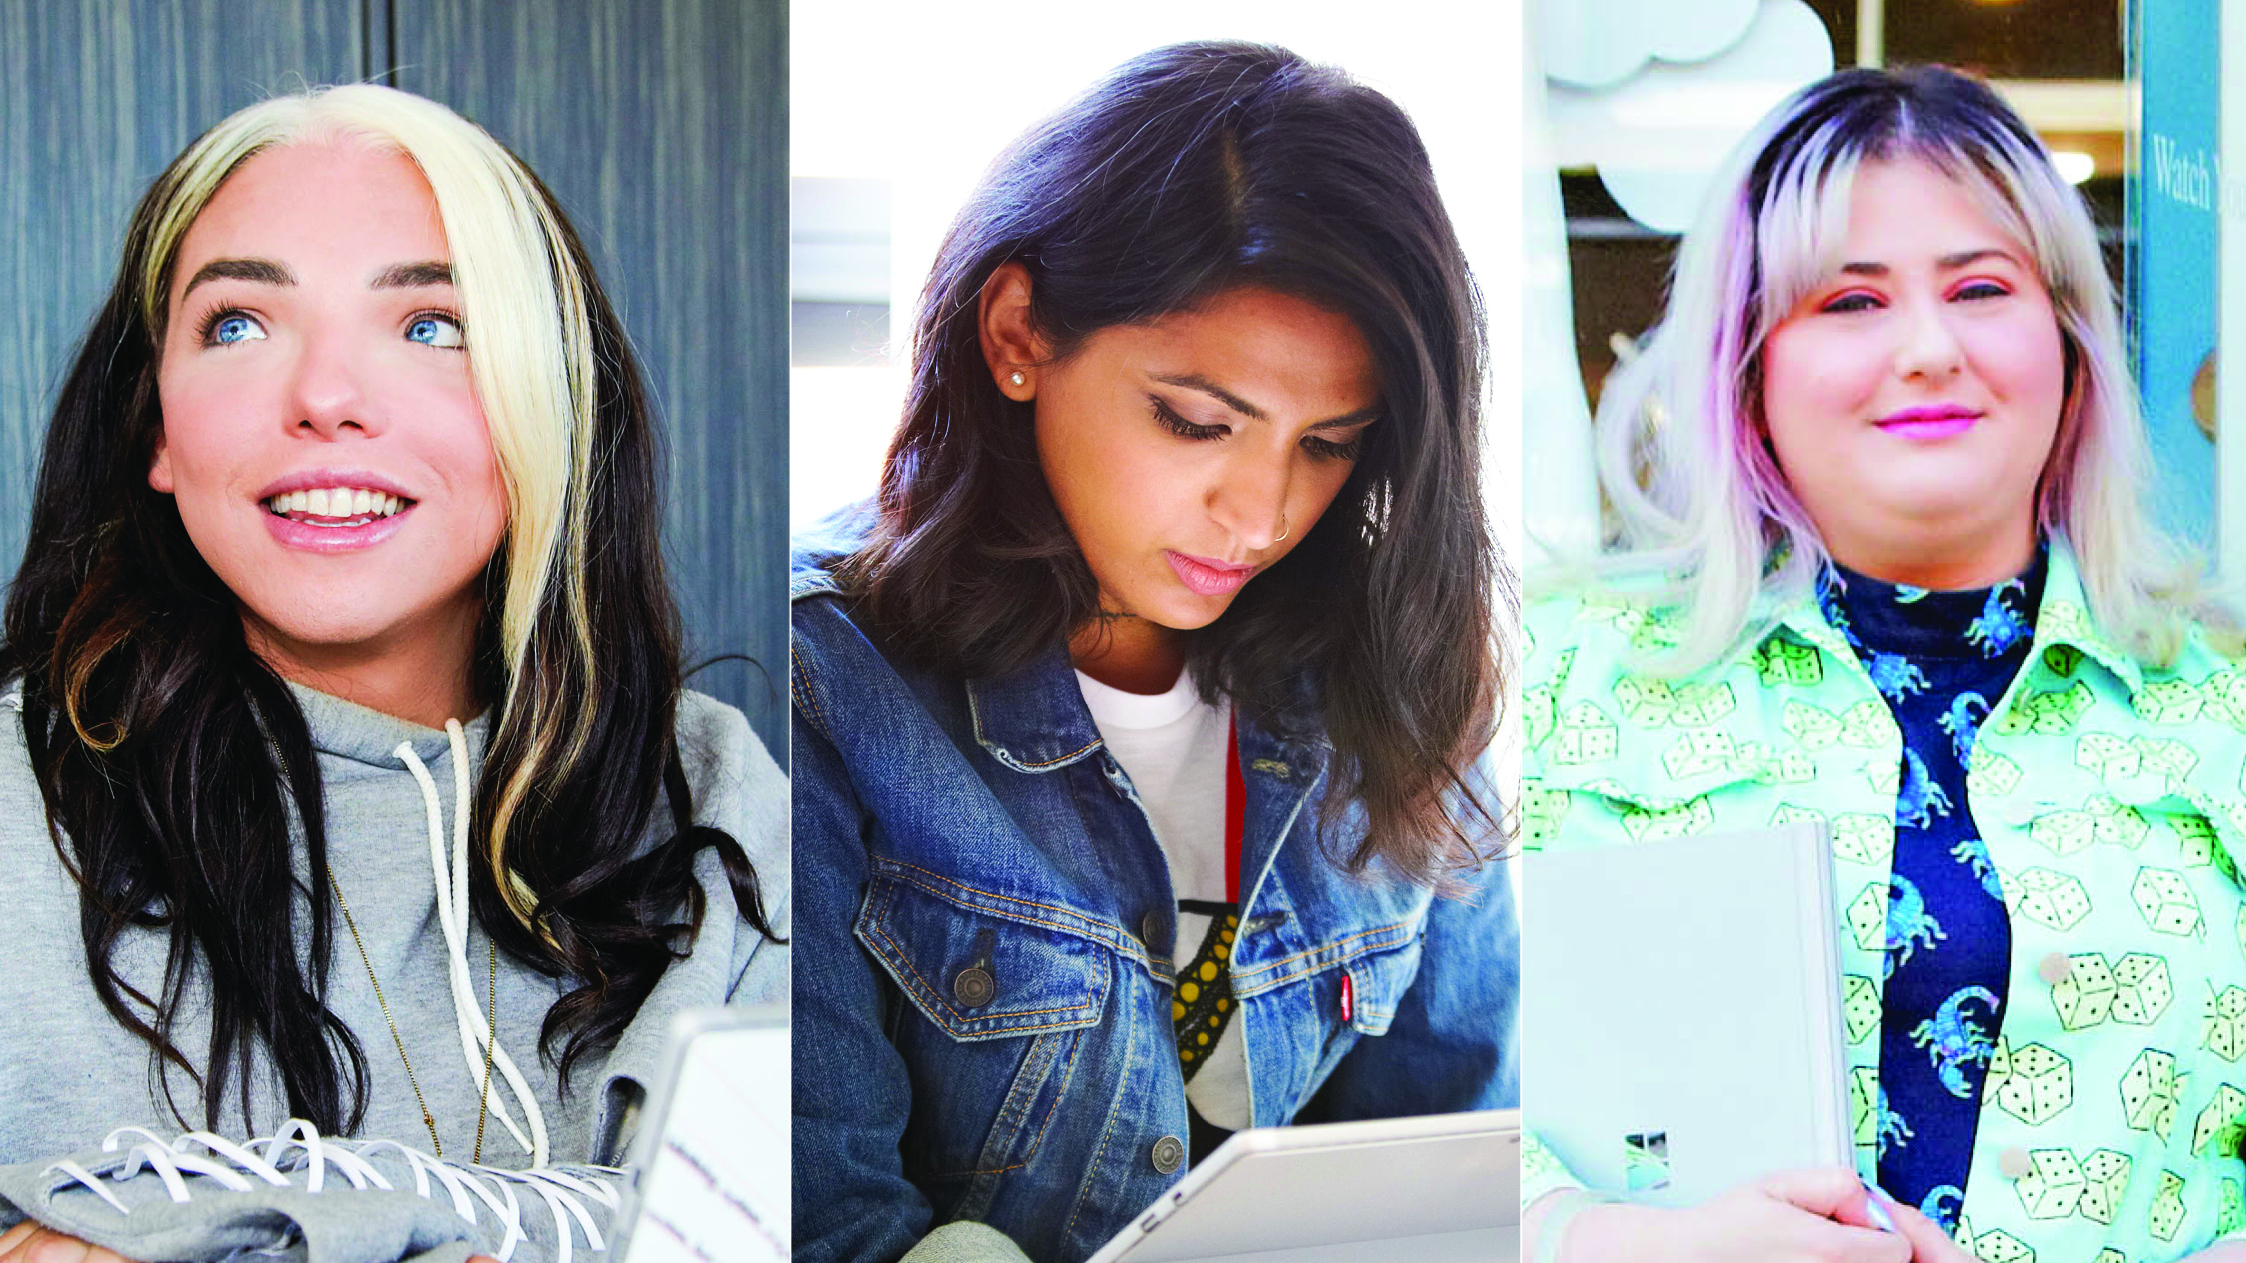 From left to right: Stef Sanjati, LGBTQ Activist; Maria Qamar, Digital Artist @Hatecopy; Hayley Elsaesser, Fashion designer